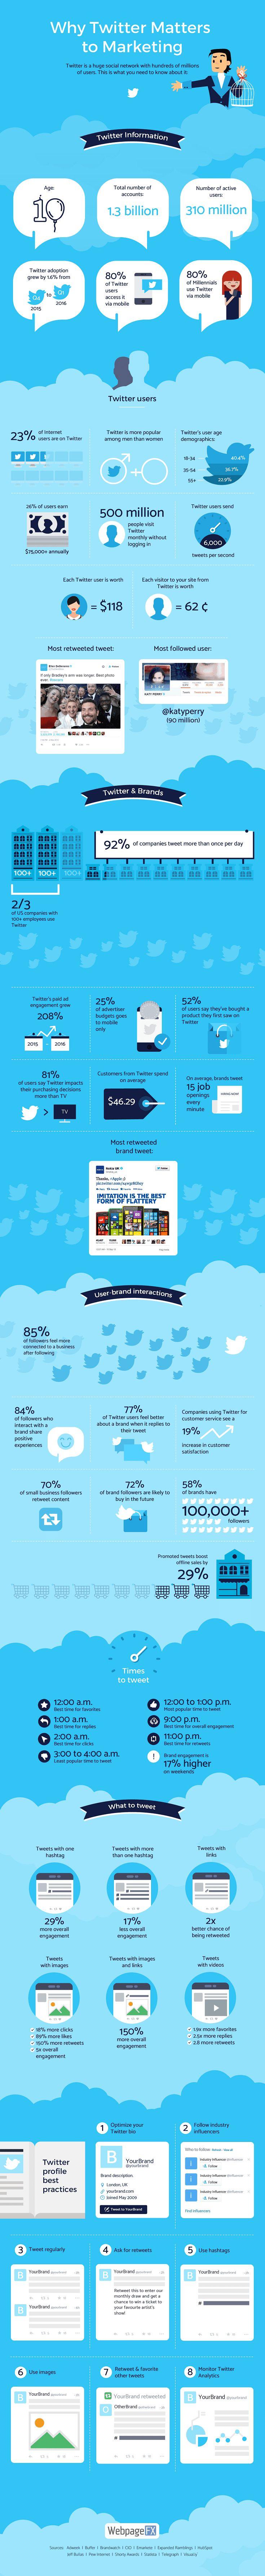 Suggested seven reasons to exploit #Marketing on #Twitter ... #SocialMedia enabler